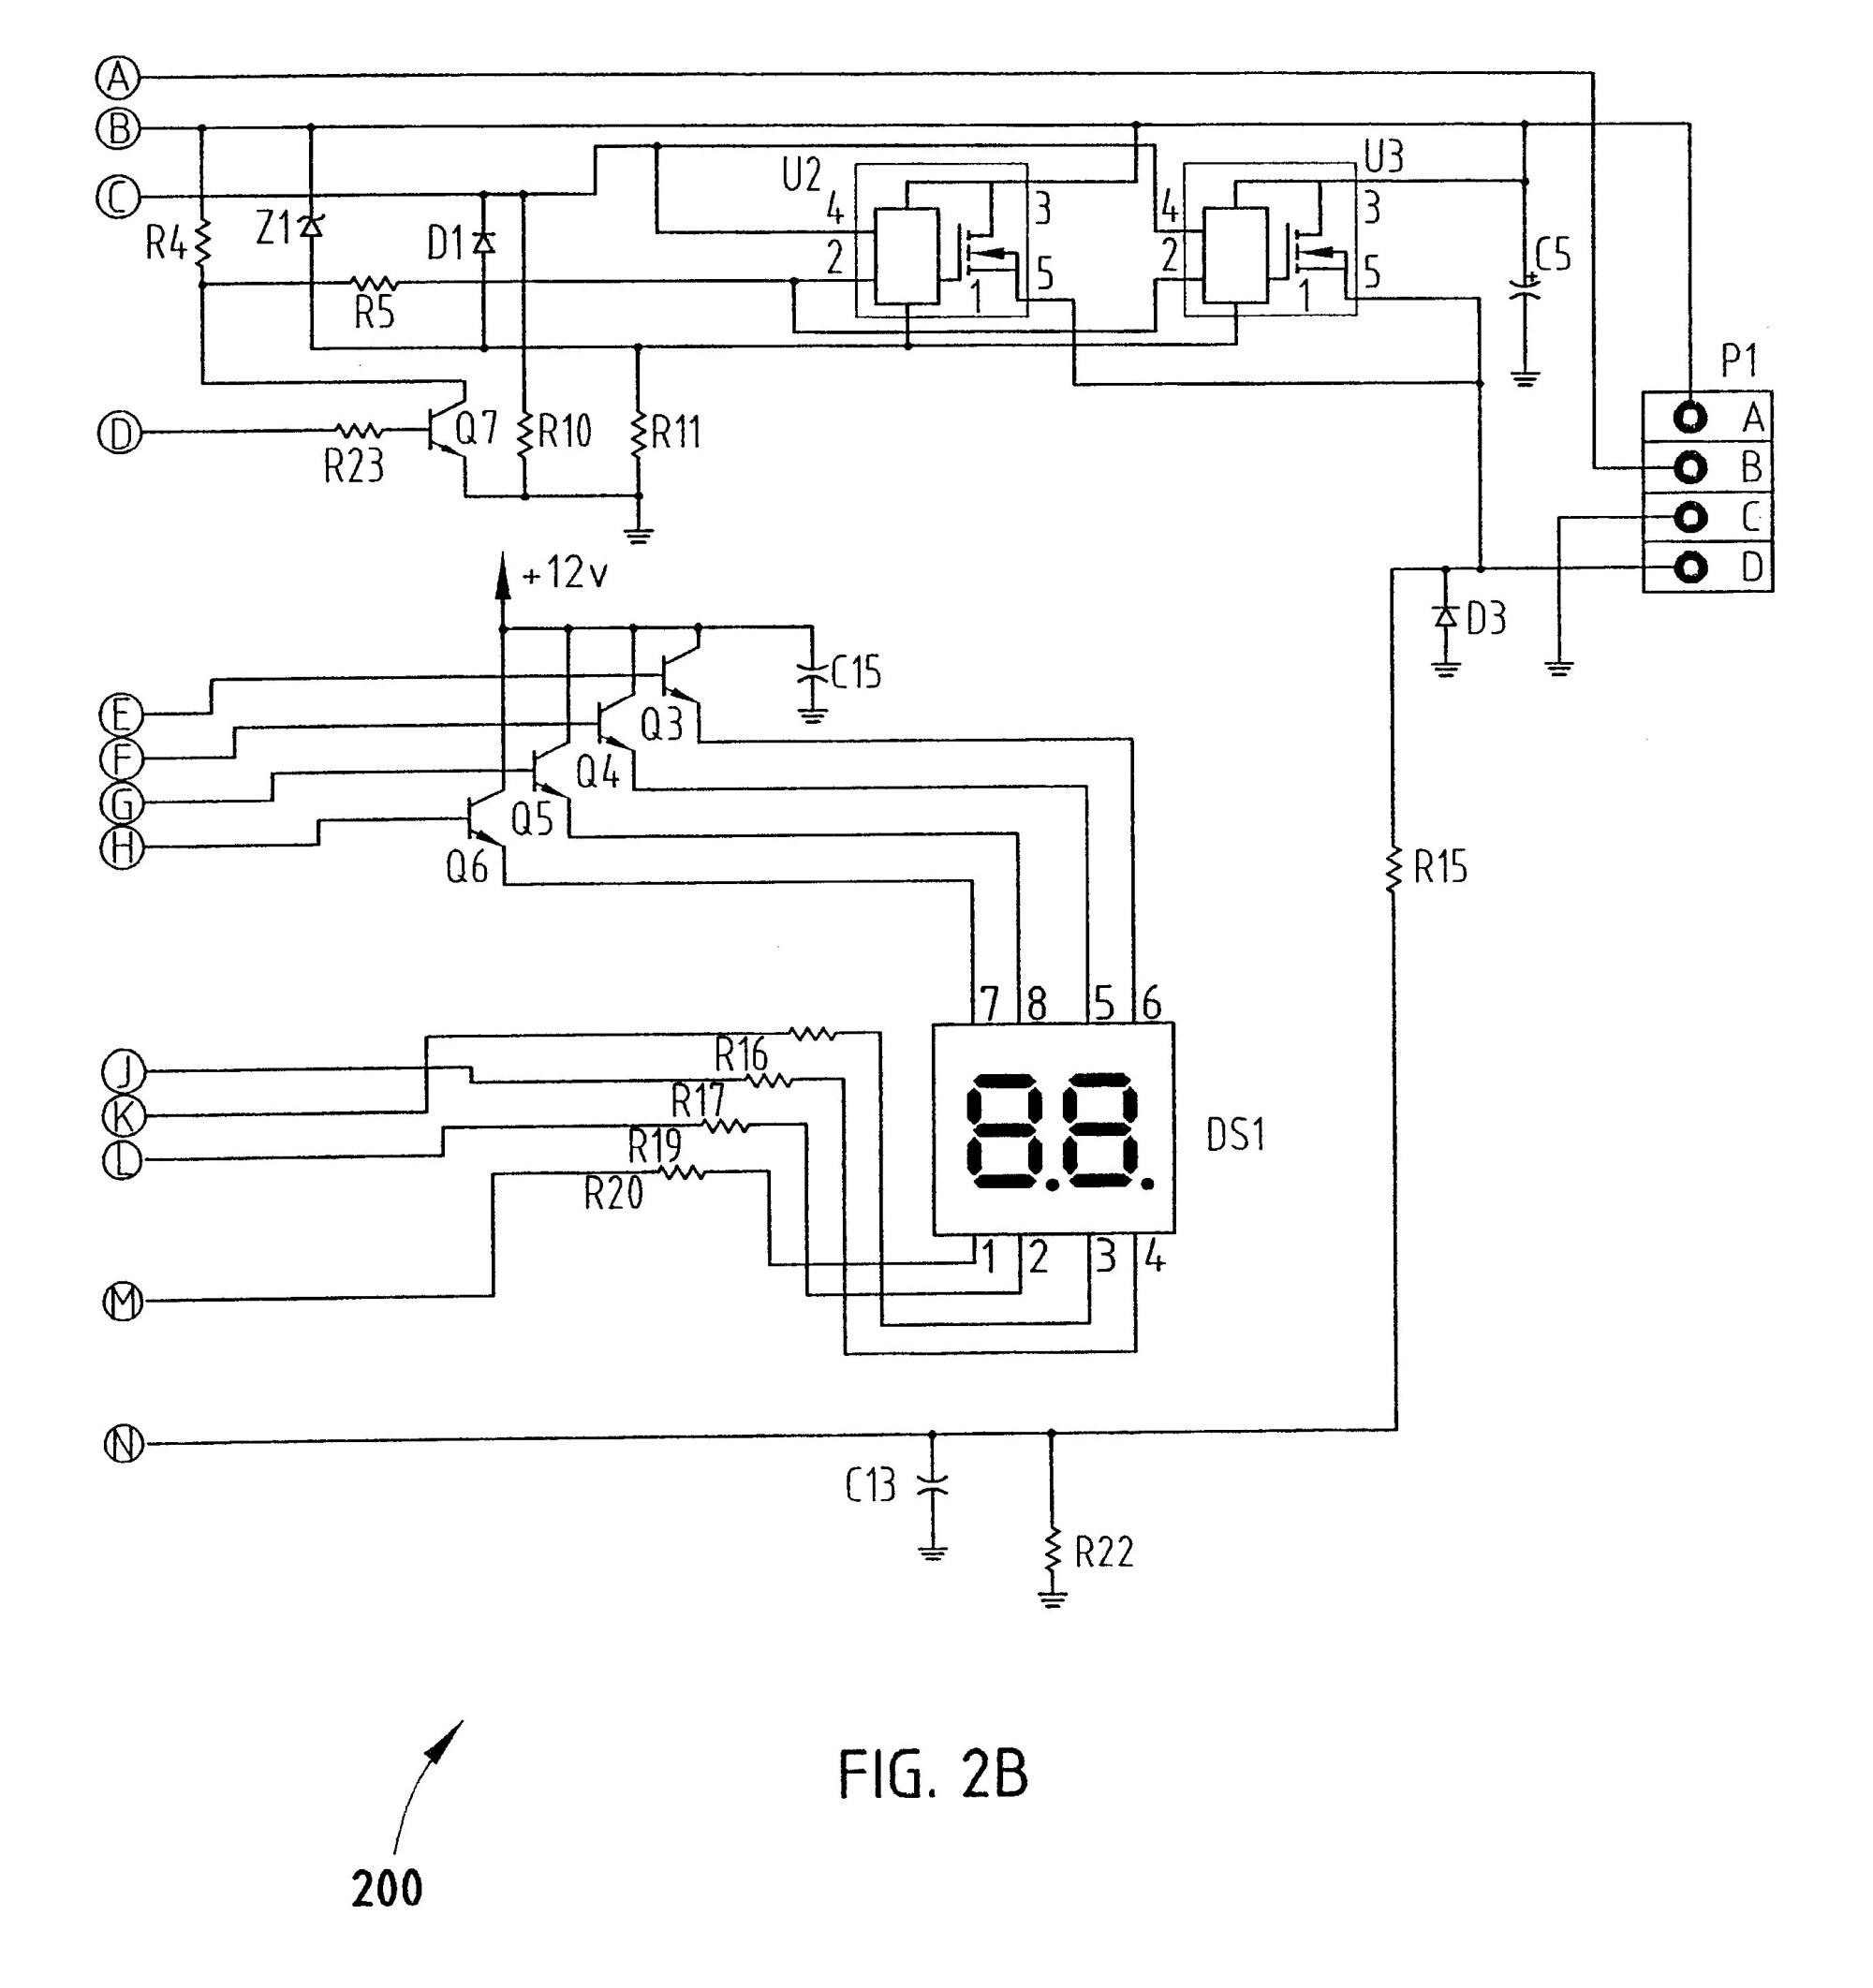 hight resolution of tekonsha brake controller wiring diagram collection wiring diagram for trailer brake controller fresh wiring diagram